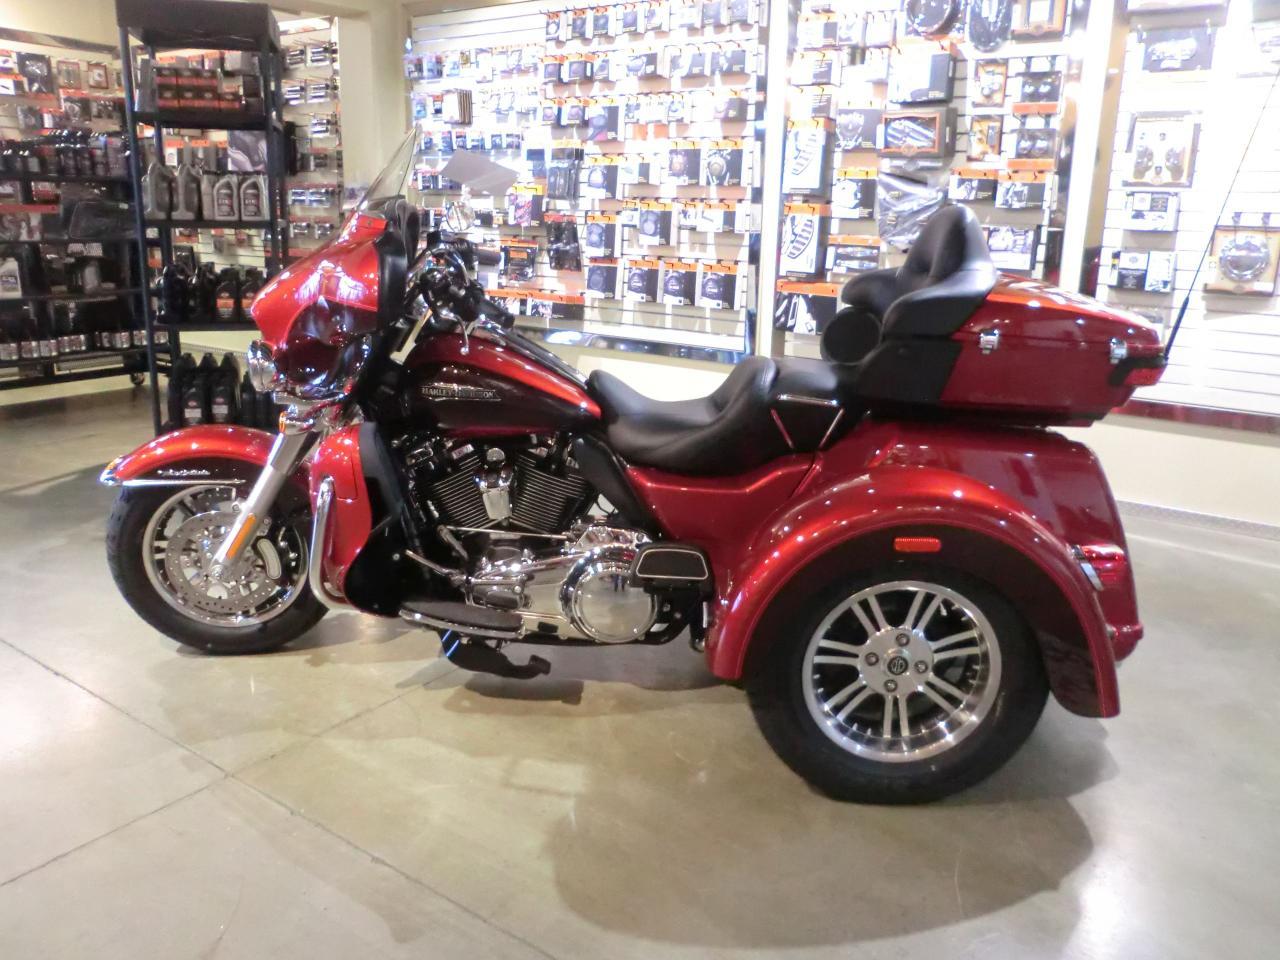 2018 Harley-Davidson Tri-Glide FLHTCUTG TRI GLIDE ULTRA